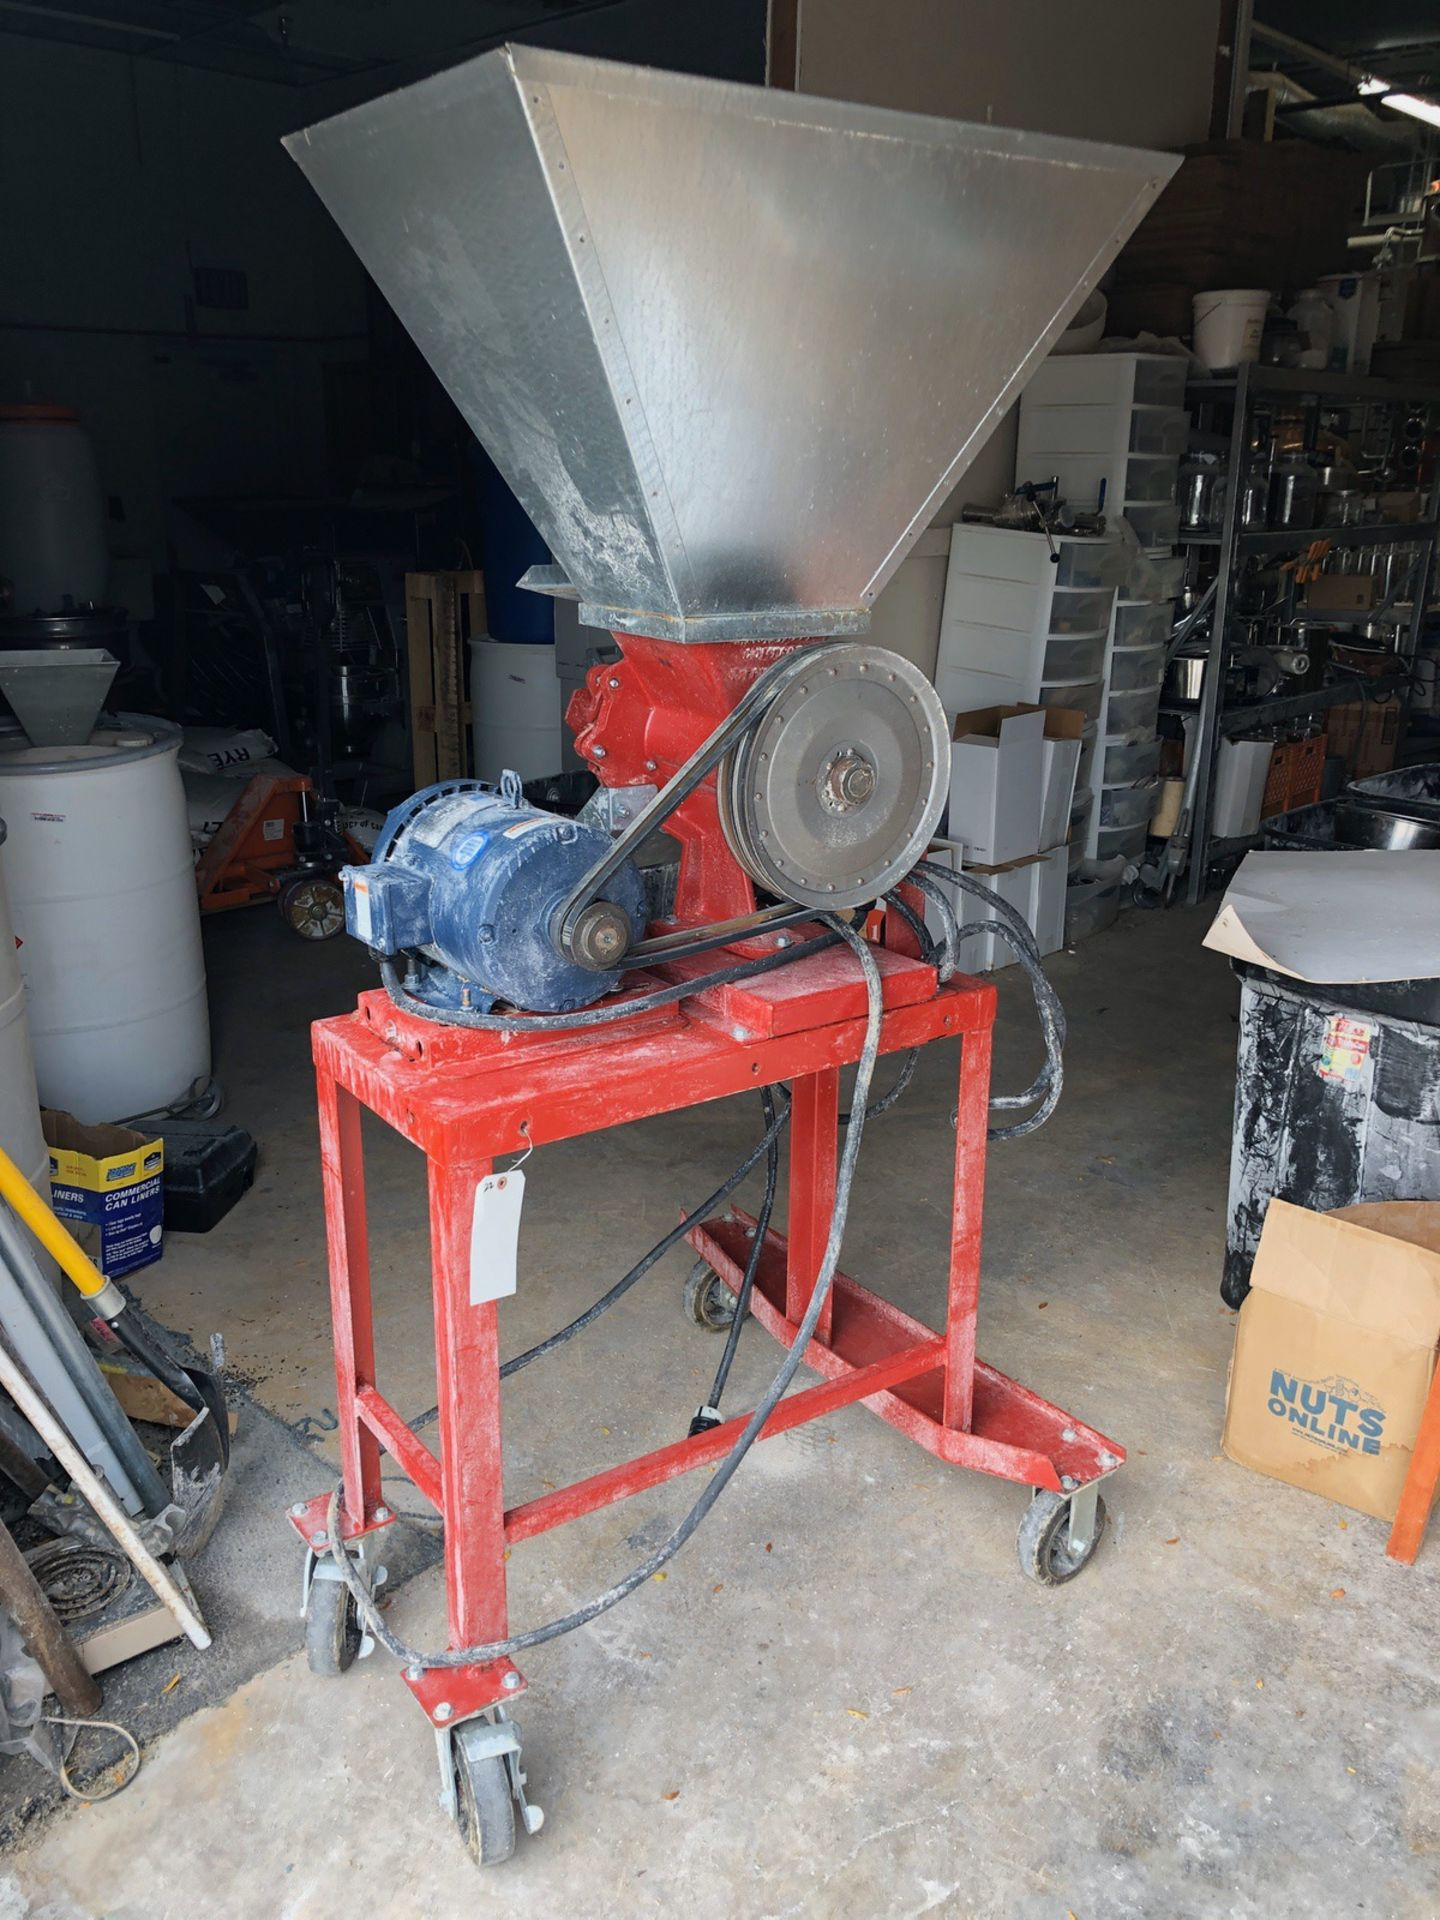 Lot 22 - 2010 CS Bell Model MILPA Mill, S/N: Virtuoso 11/10 | Sub to Bulk | Rig Fee: $100